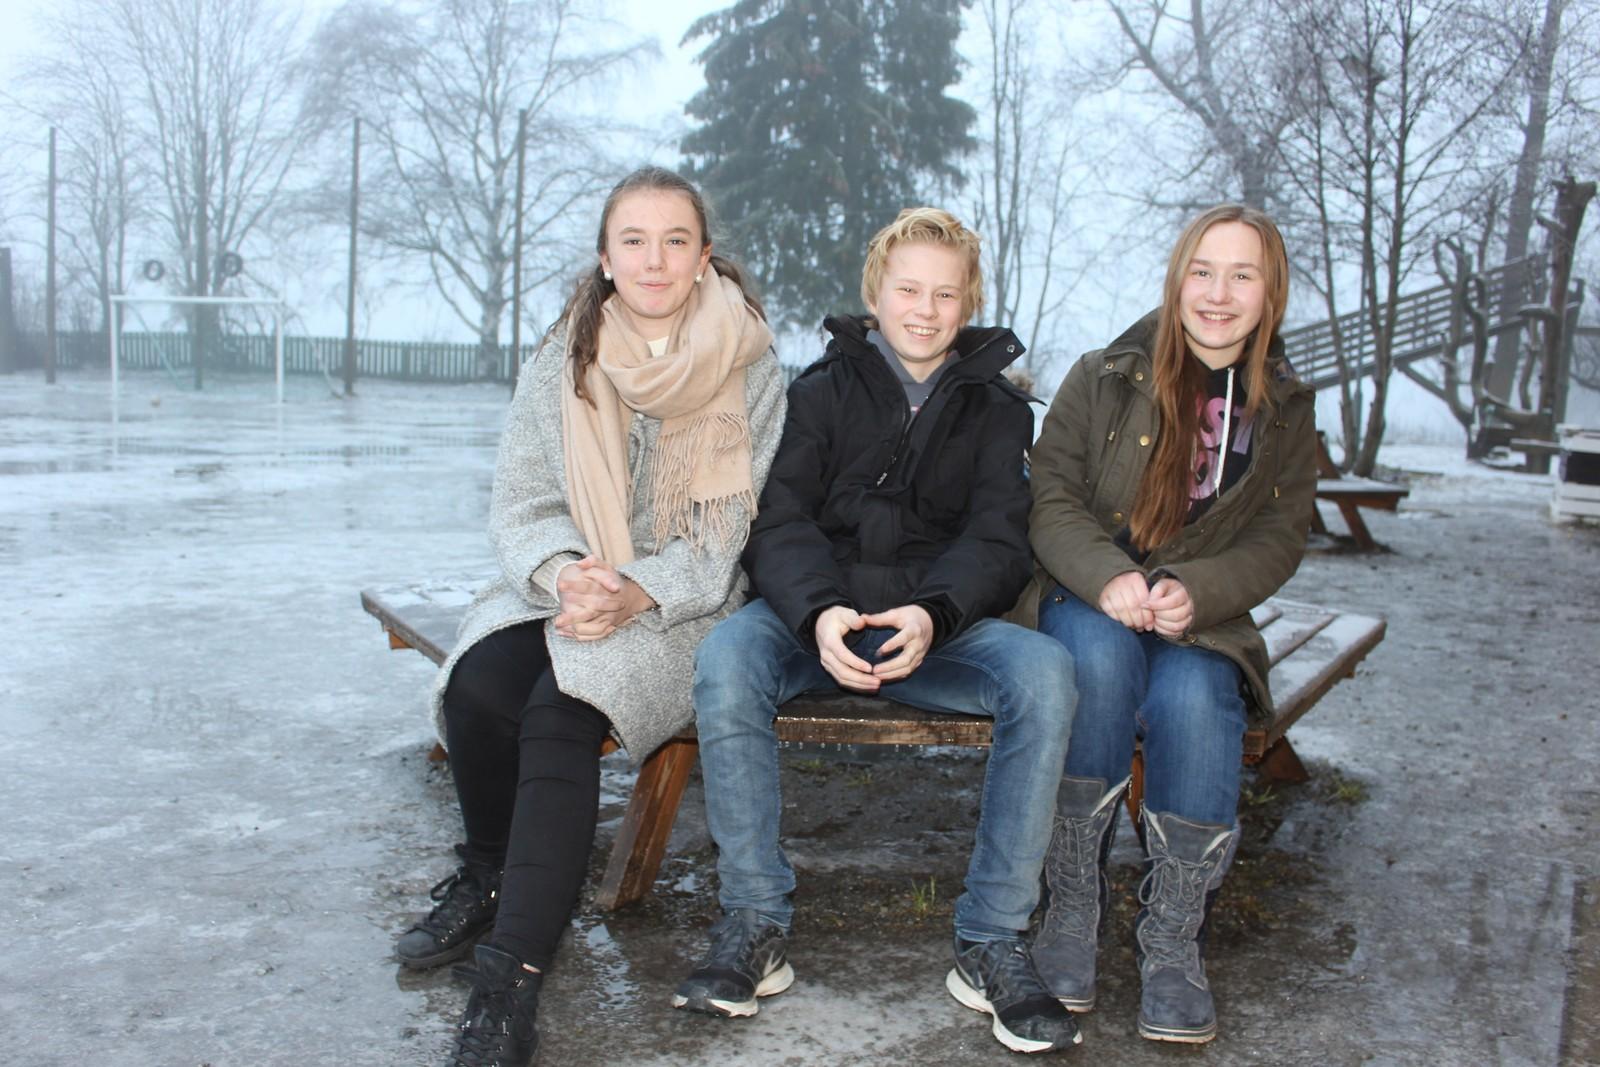 Hedemarken friskole klarte 9 poeng på Klassequizen. F.v. Amanda Tørring, Simon Bogen og Ragnhild Haakenstad